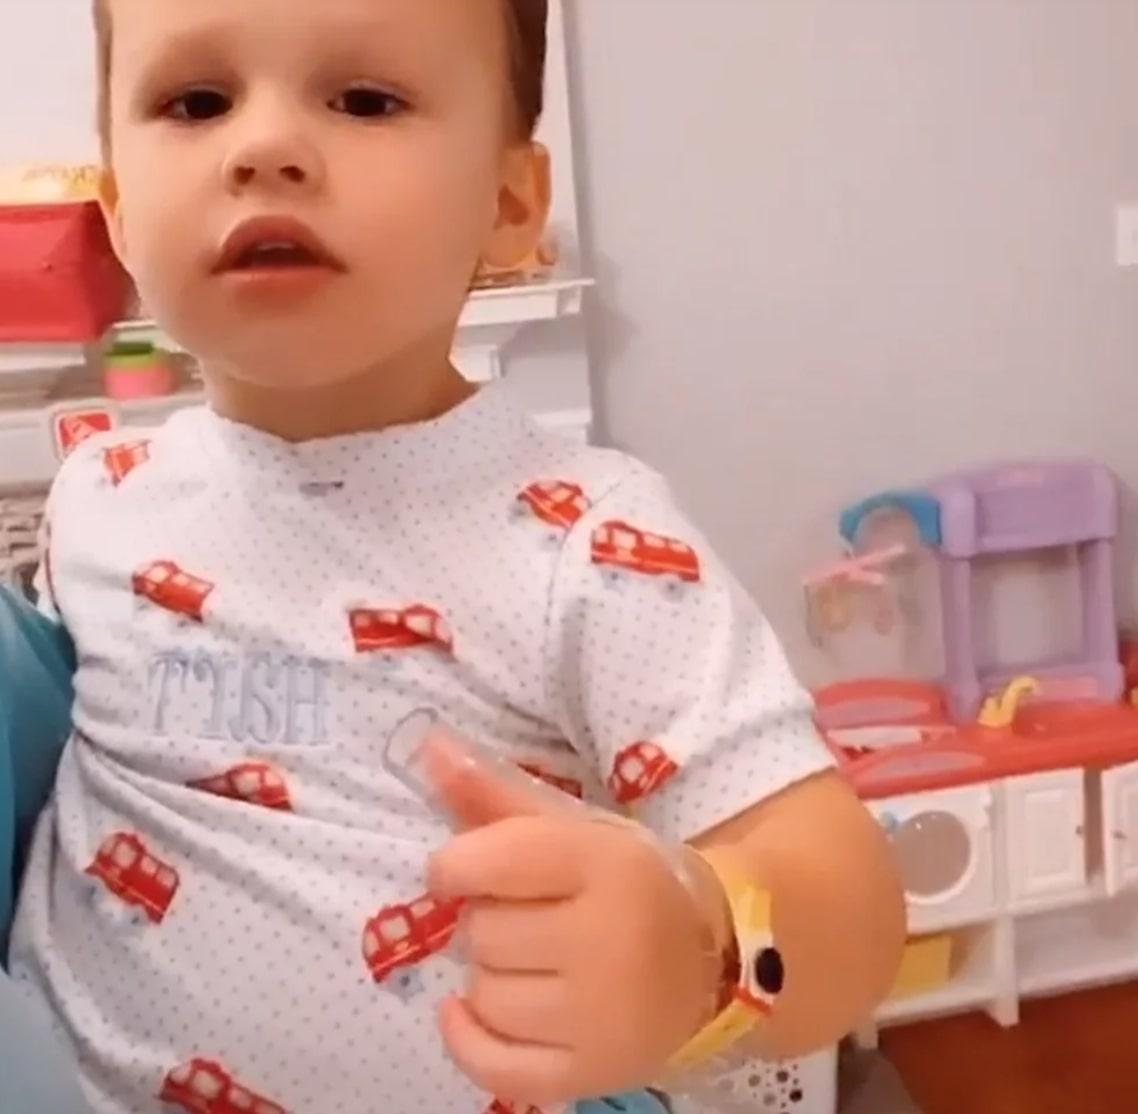 Meghan King Shows Off Hart's Anti-Thumb-Sucking Apparatus